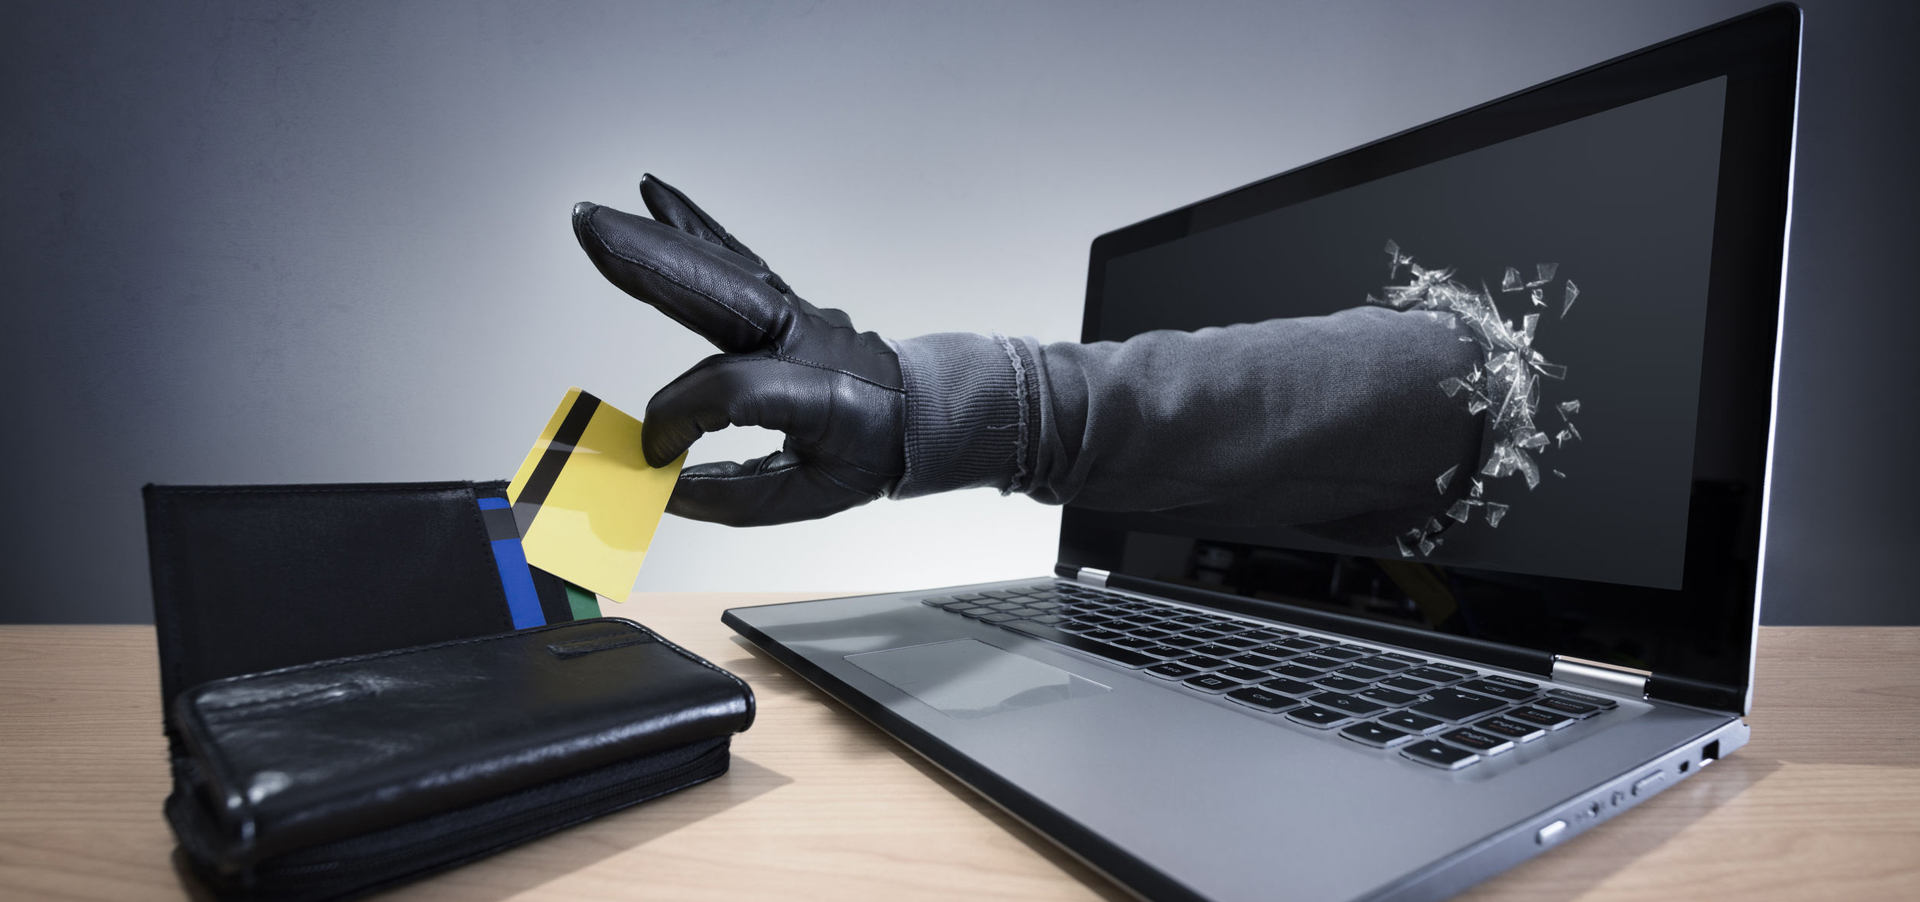 Ideas on Stopping Identification Theft